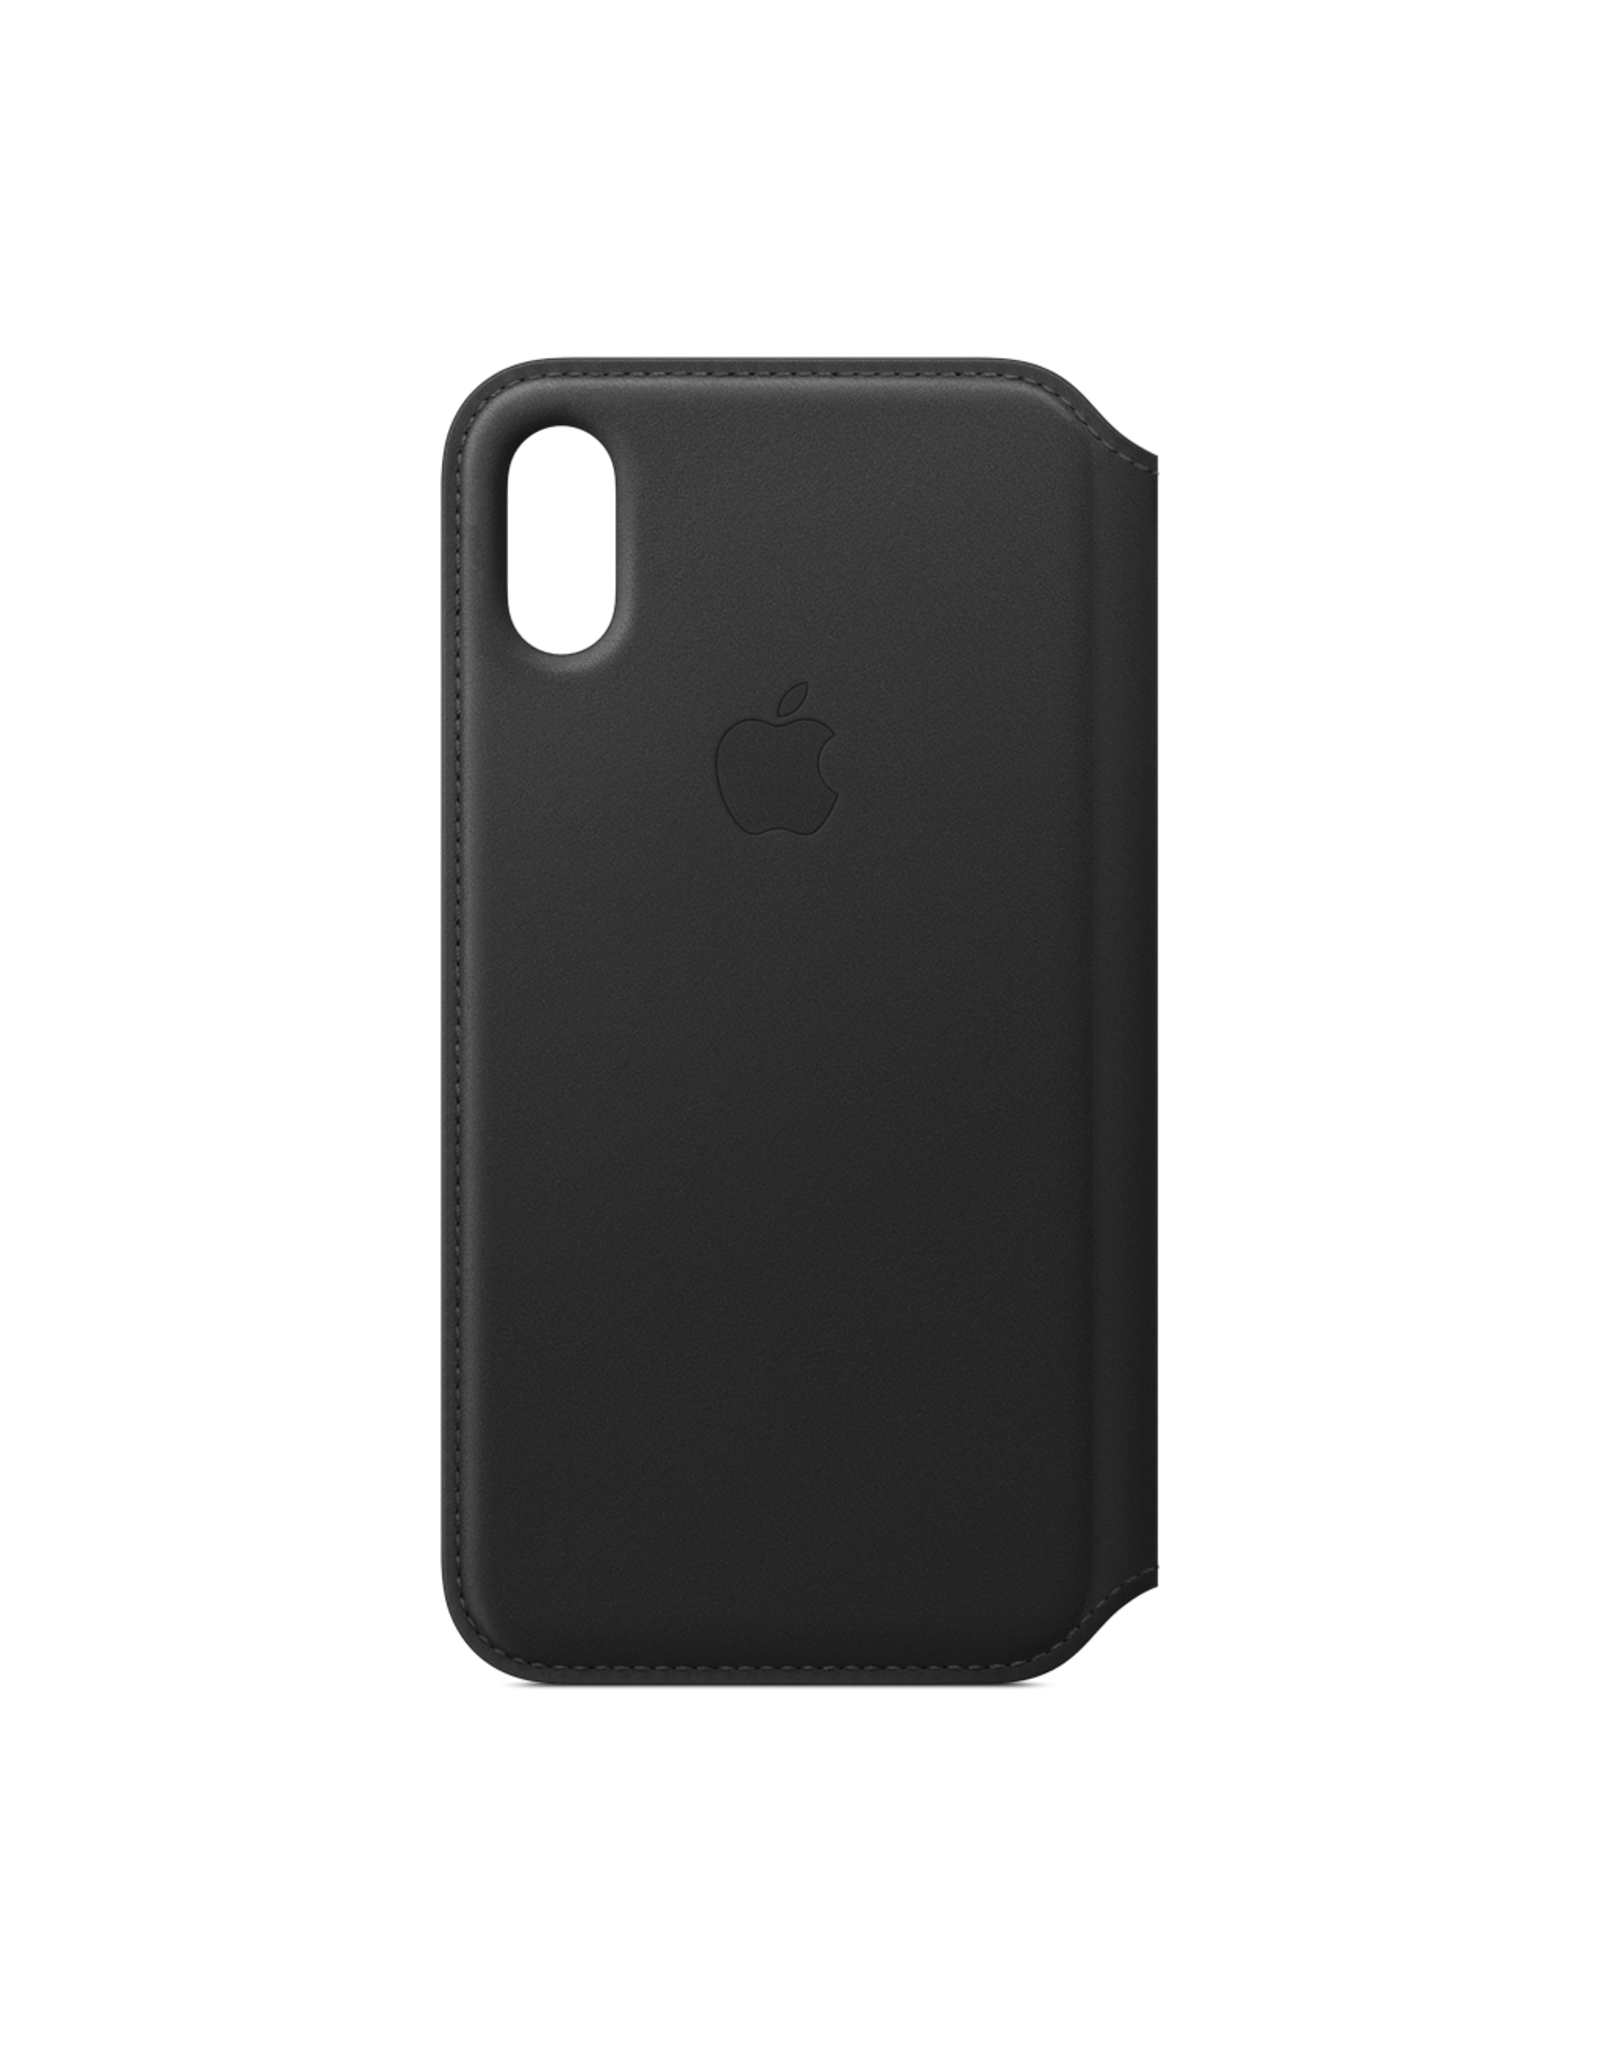 Apple Apple iPhone XS Leather Folio Black